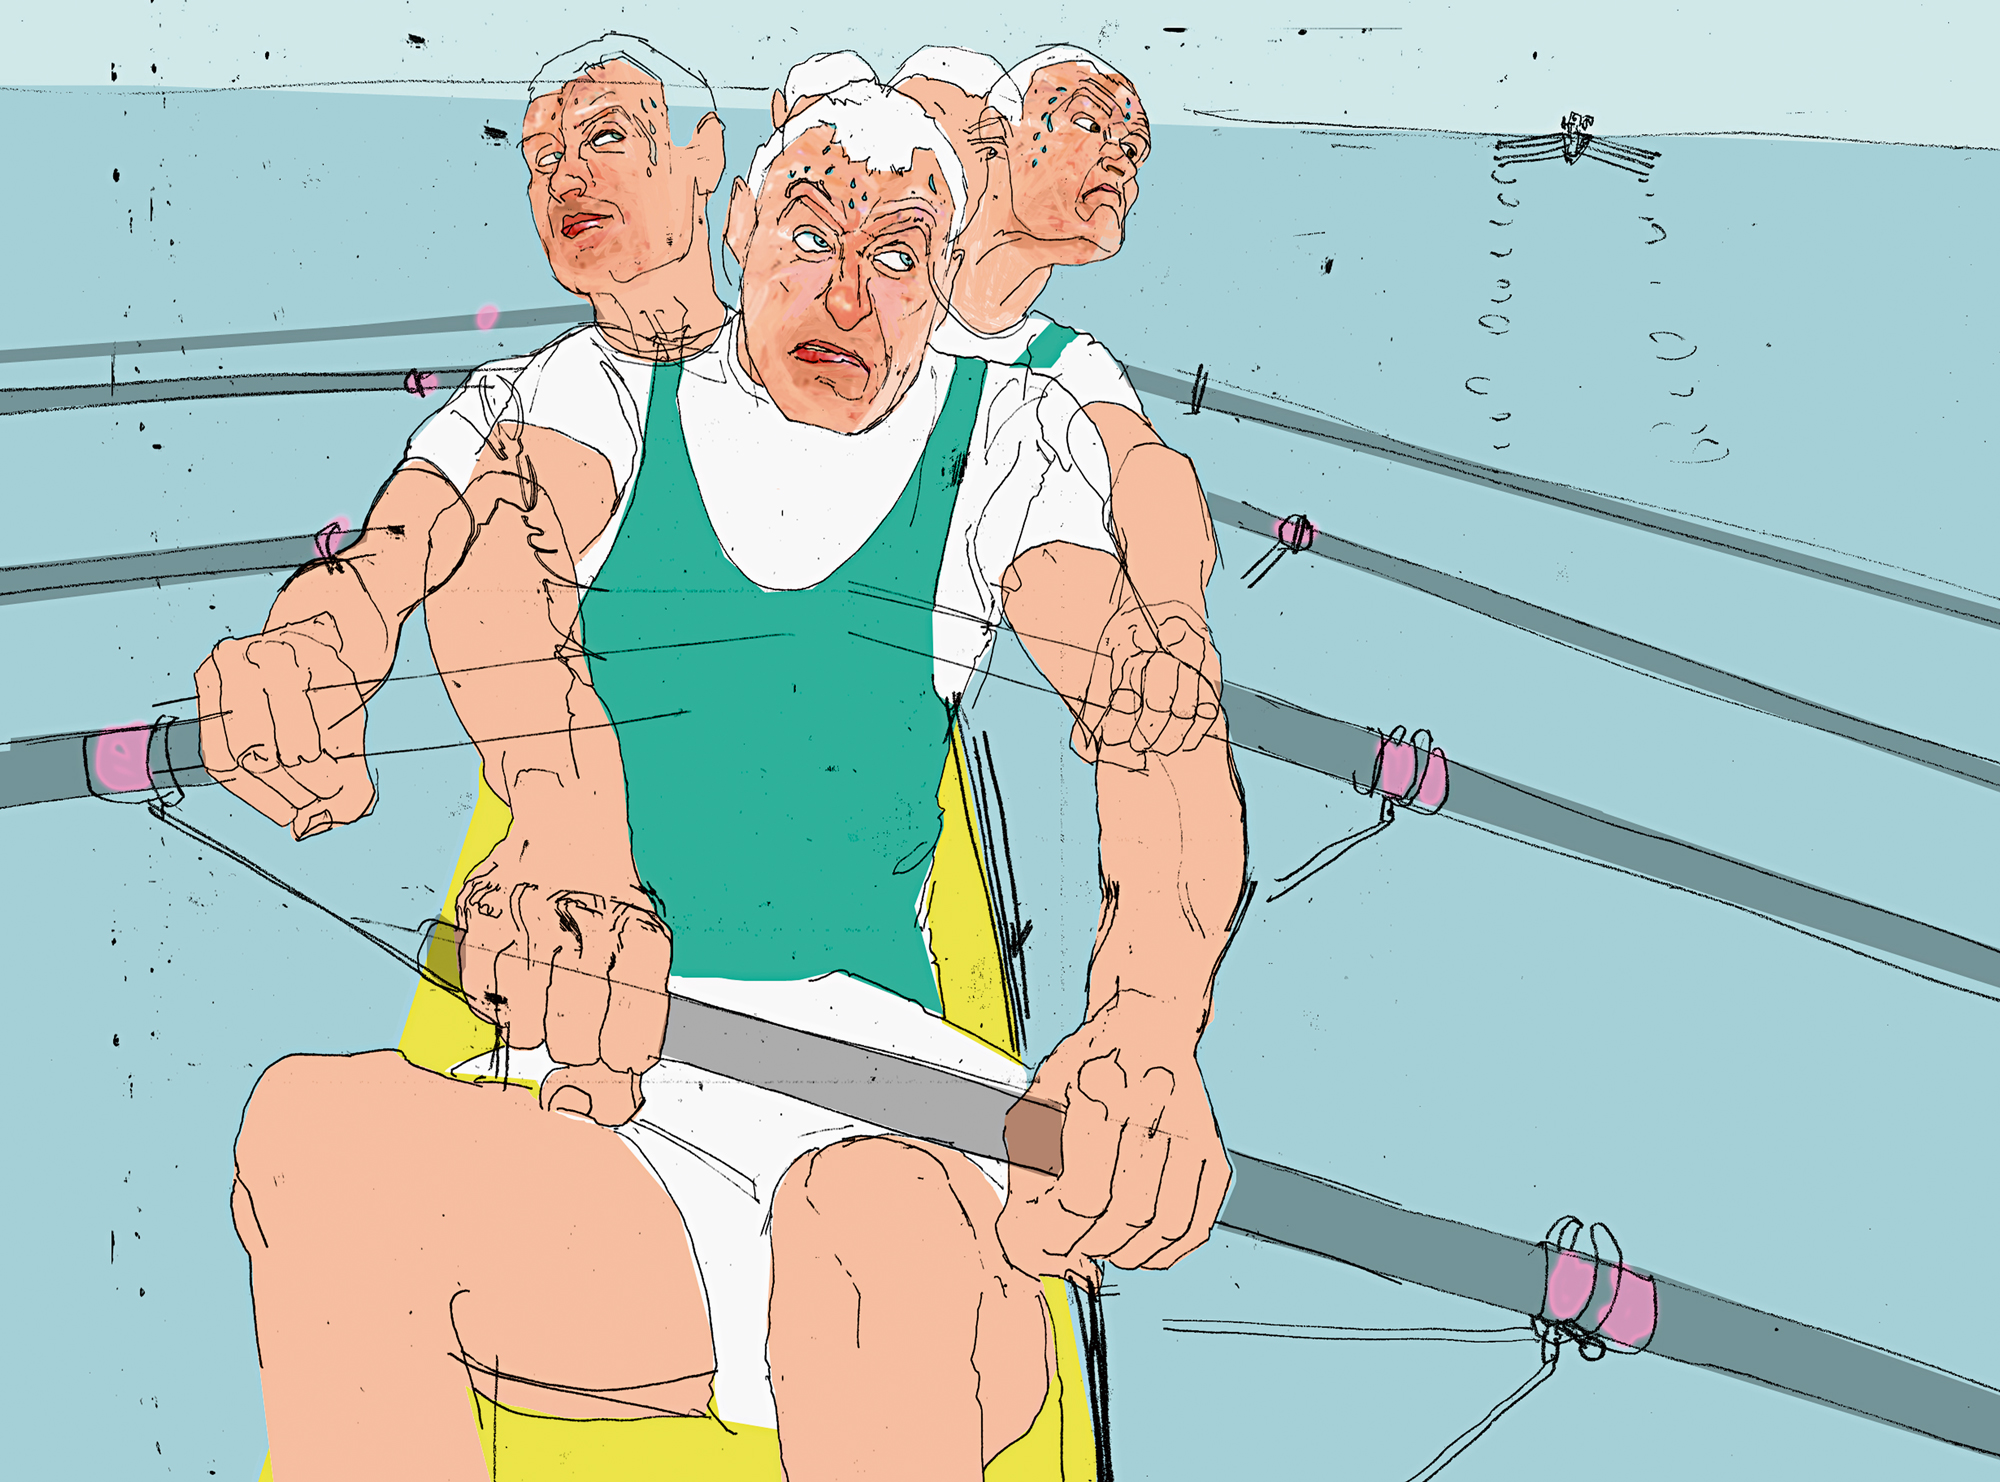 träna prostatan